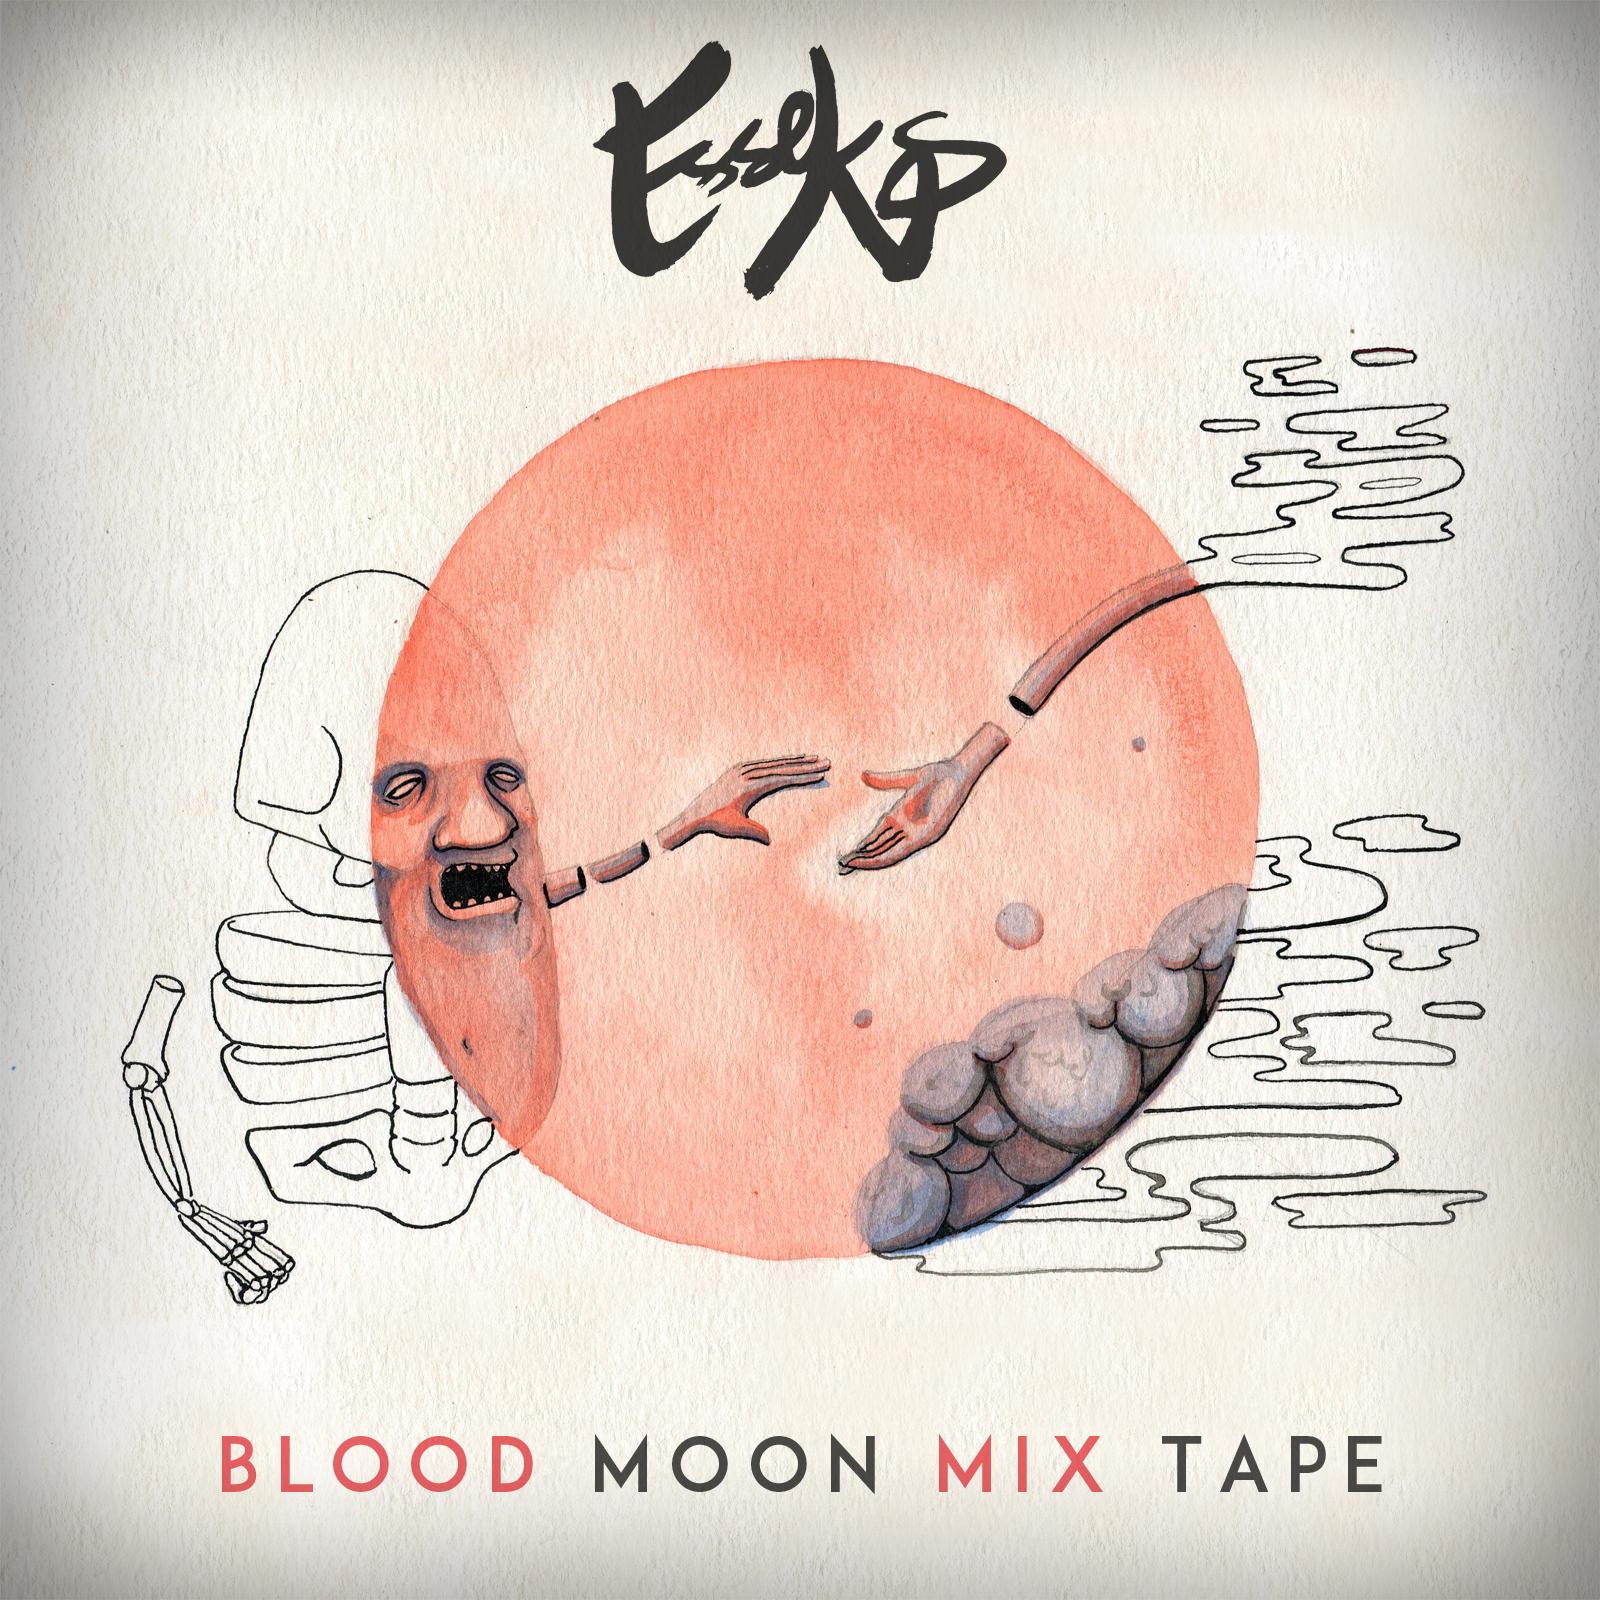 BLOODMOON_MIX_Tape_art.jpg